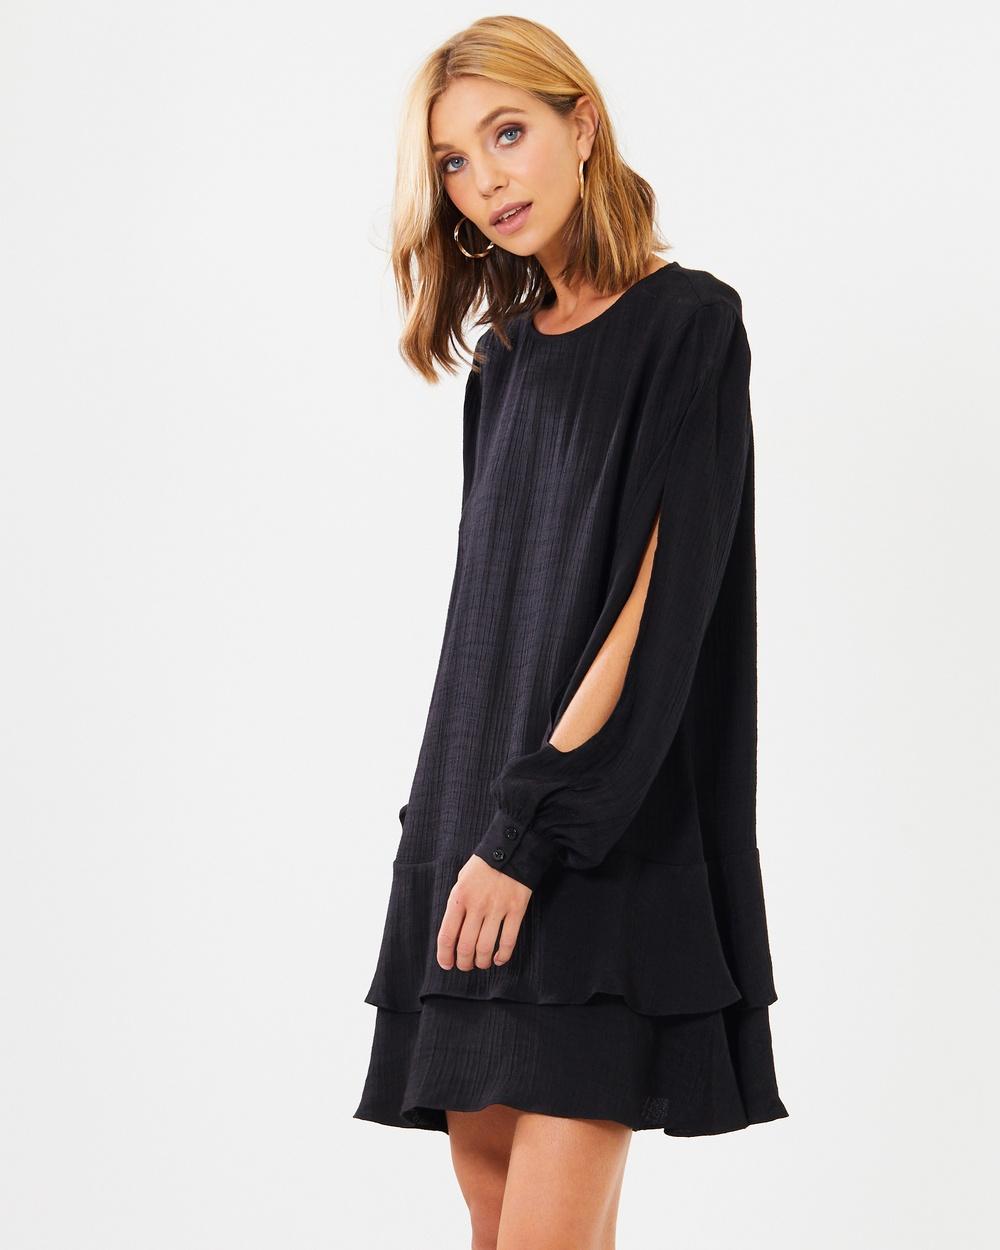 Calli Black Cheree Dress